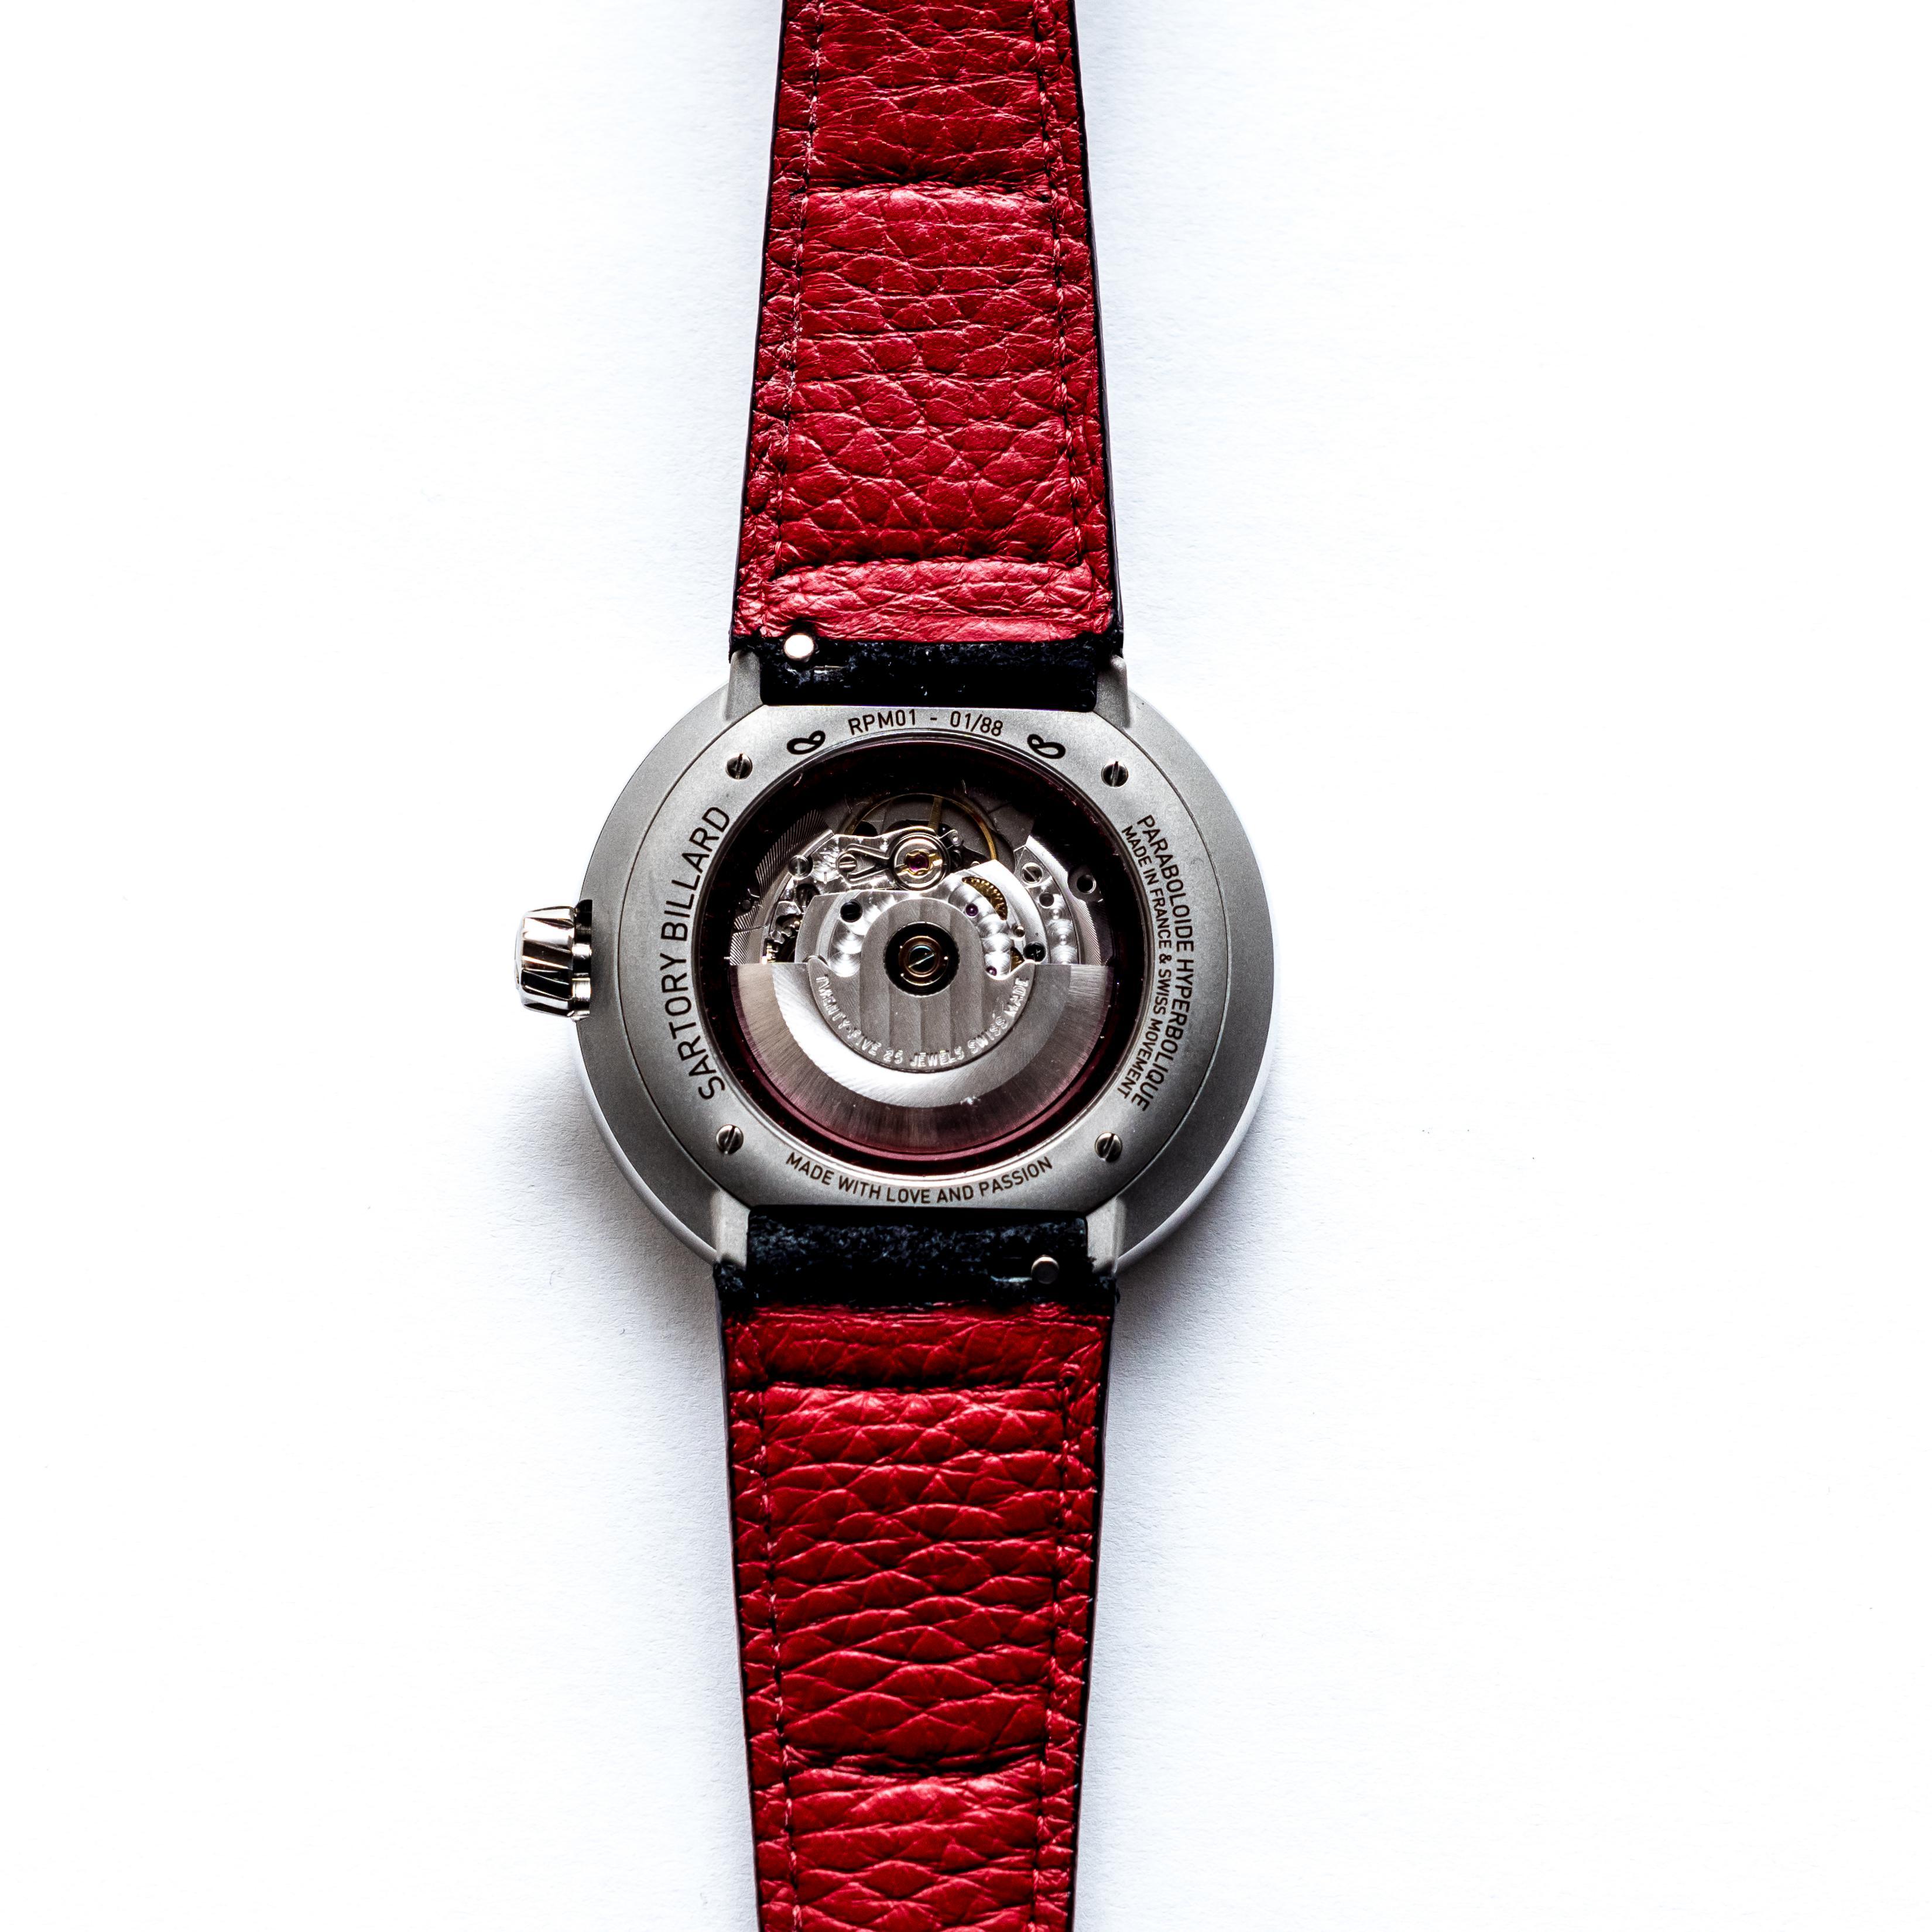 Naissance d'une nouvelle montre française : SARTORY BILLARD RPM01 - Page 2 SARTORY-BILLARD-fond-blanc-dos